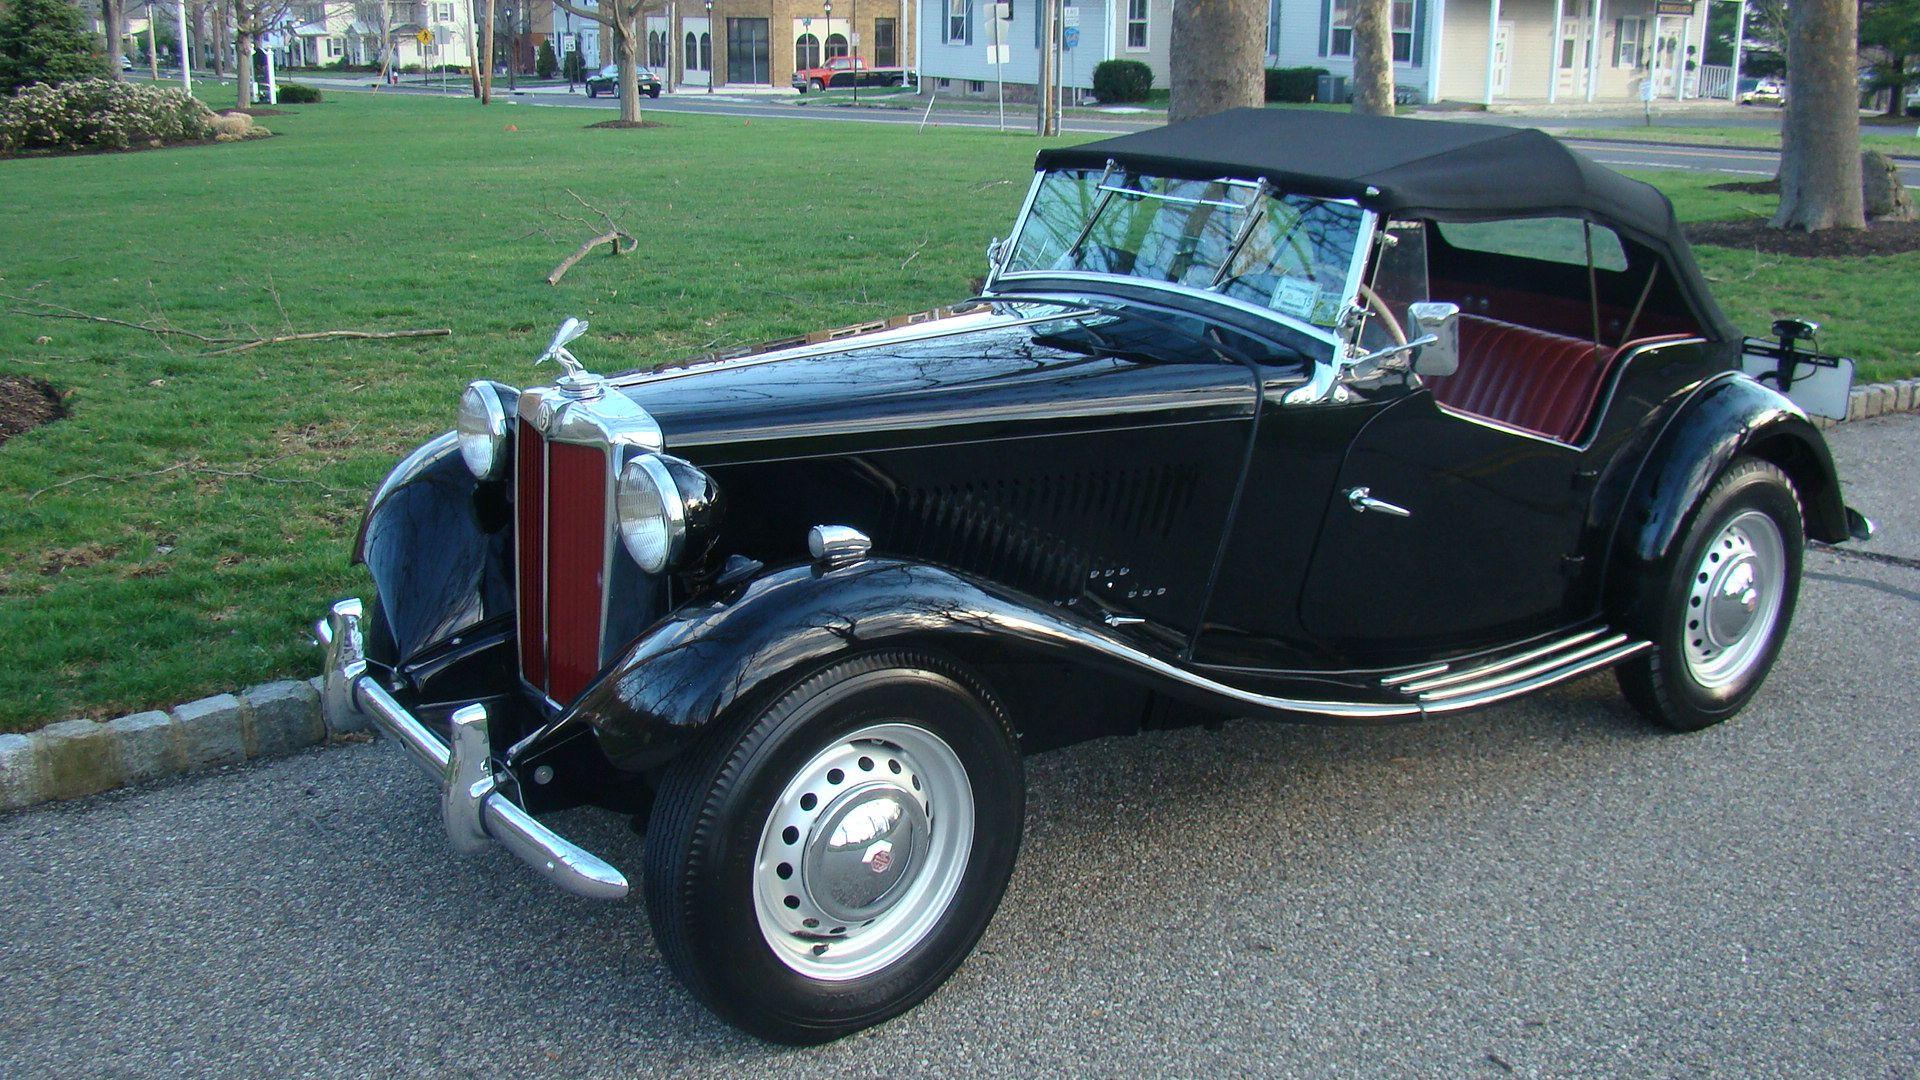 1950 MG TD | Automobiles | Pinterest | Cars, Dream machine and Wheels